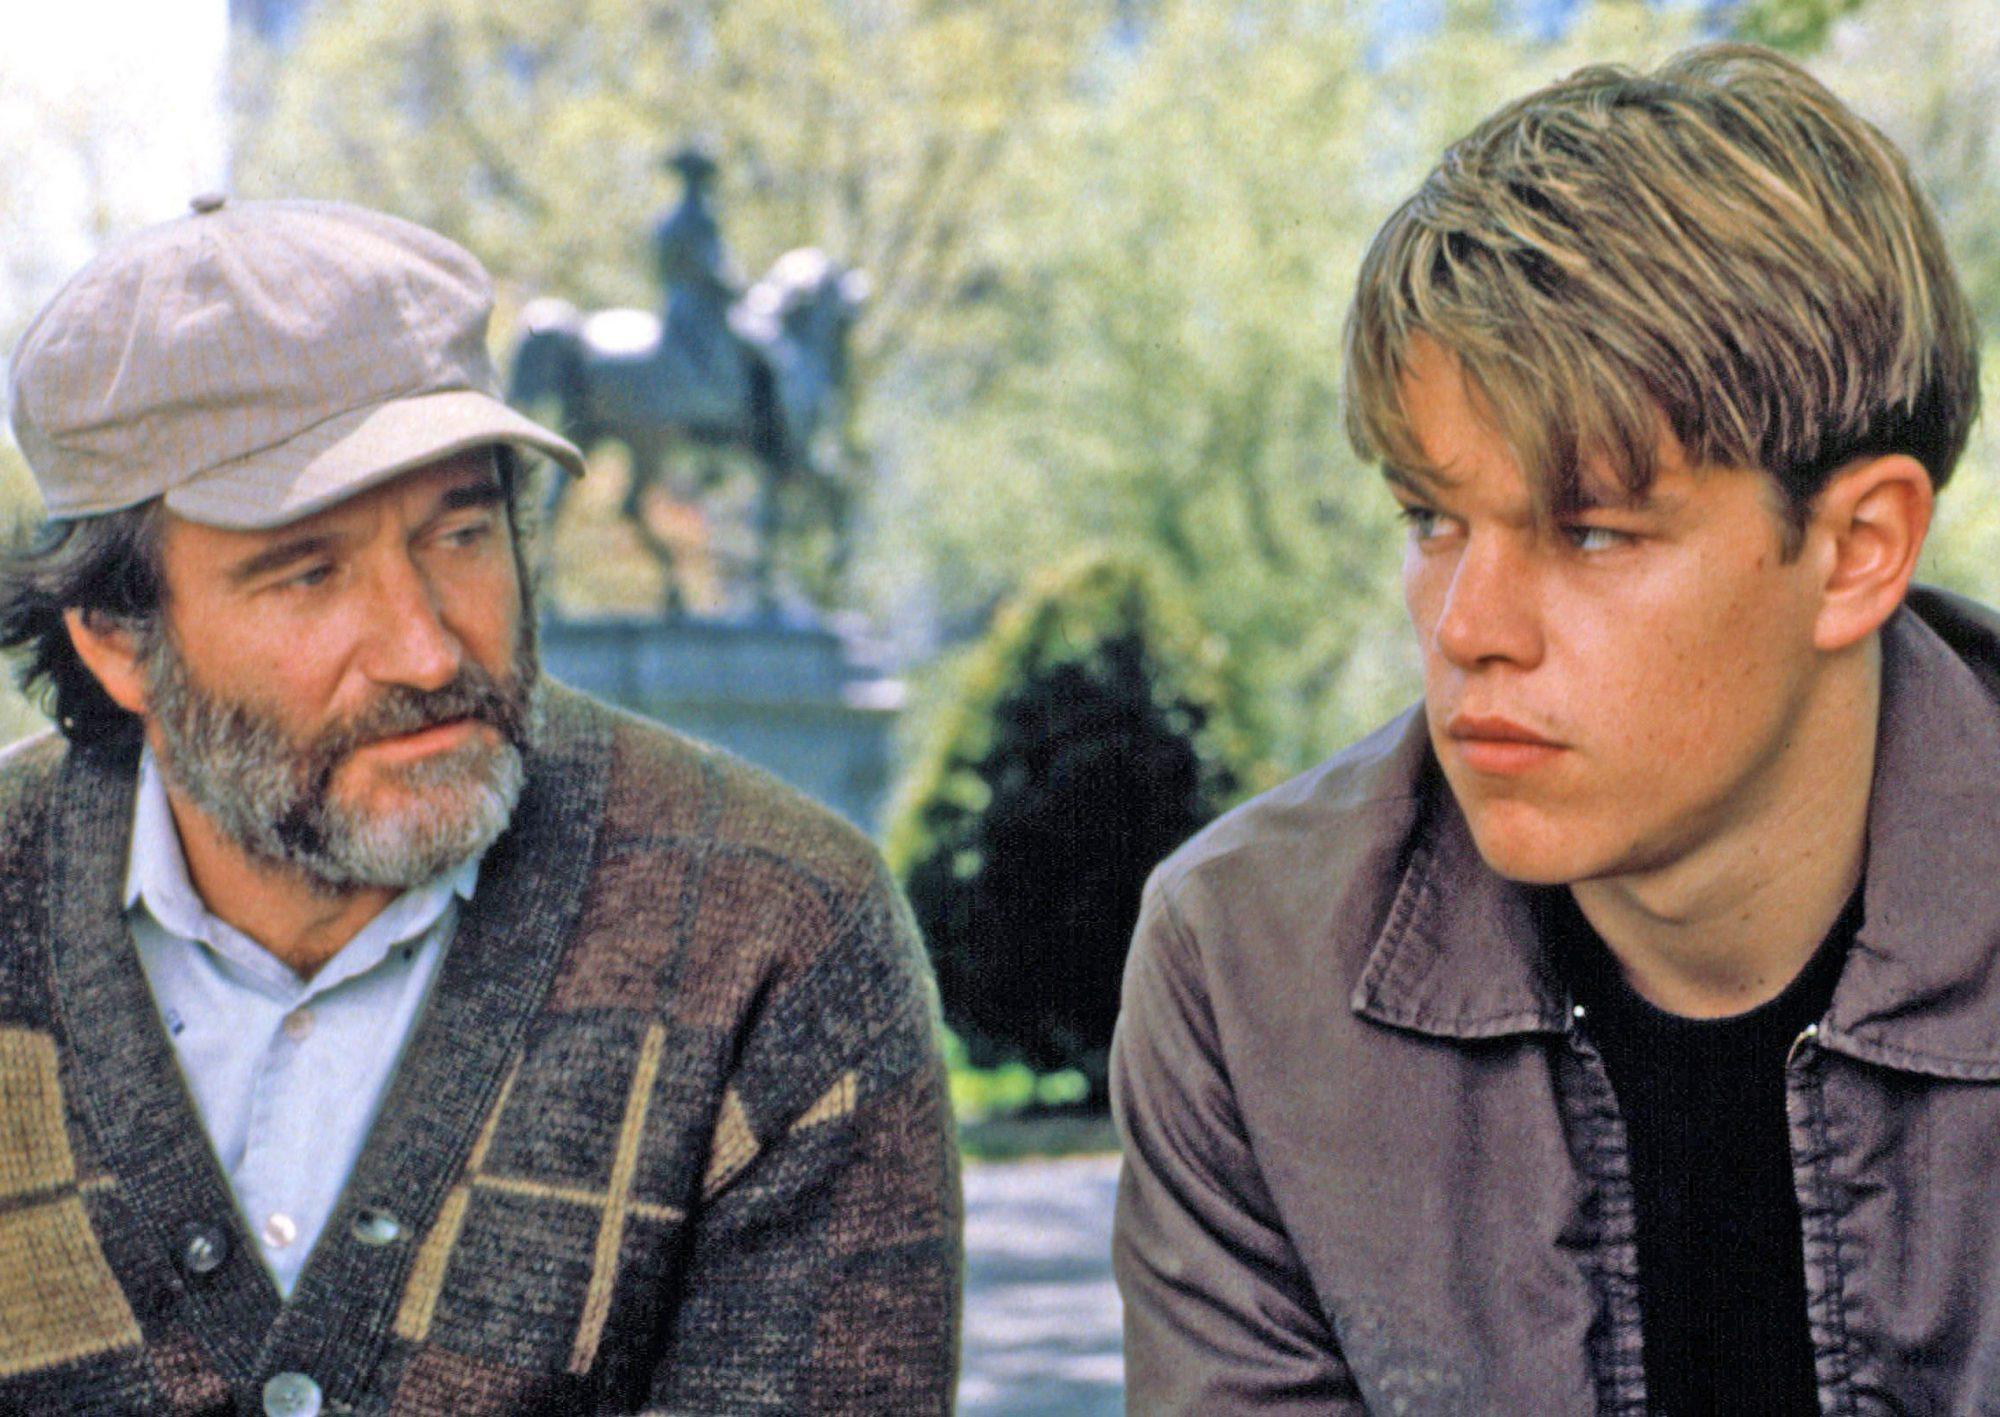 Matt Damon remembers Good Will Hunting costar Robin Williams